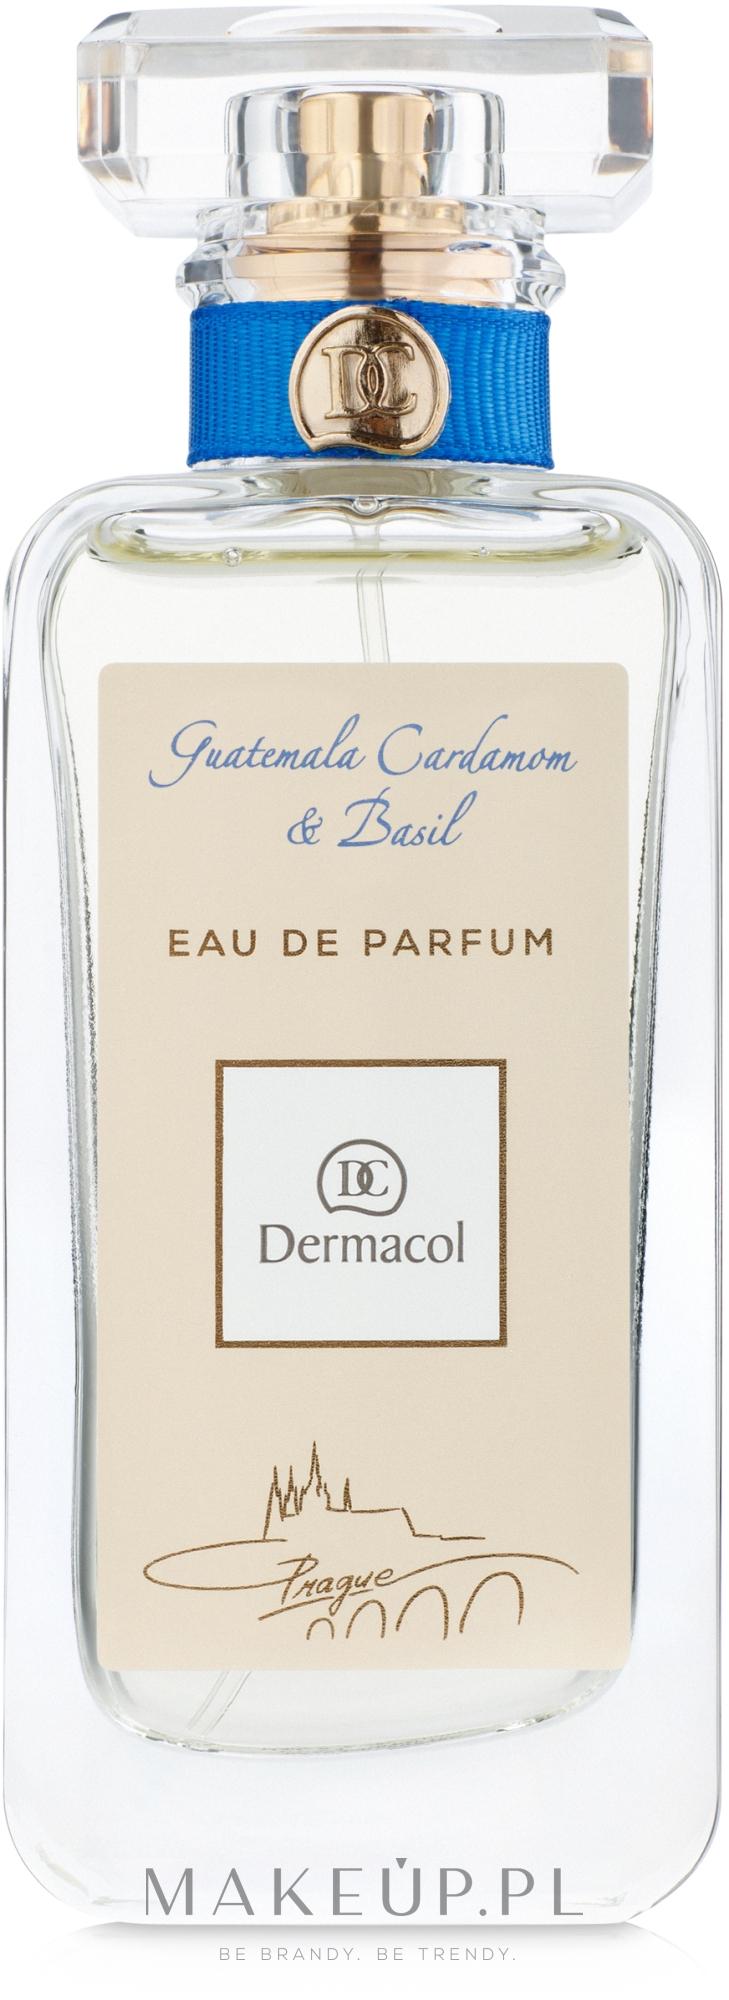 dermacol guatemala cardamom & basil